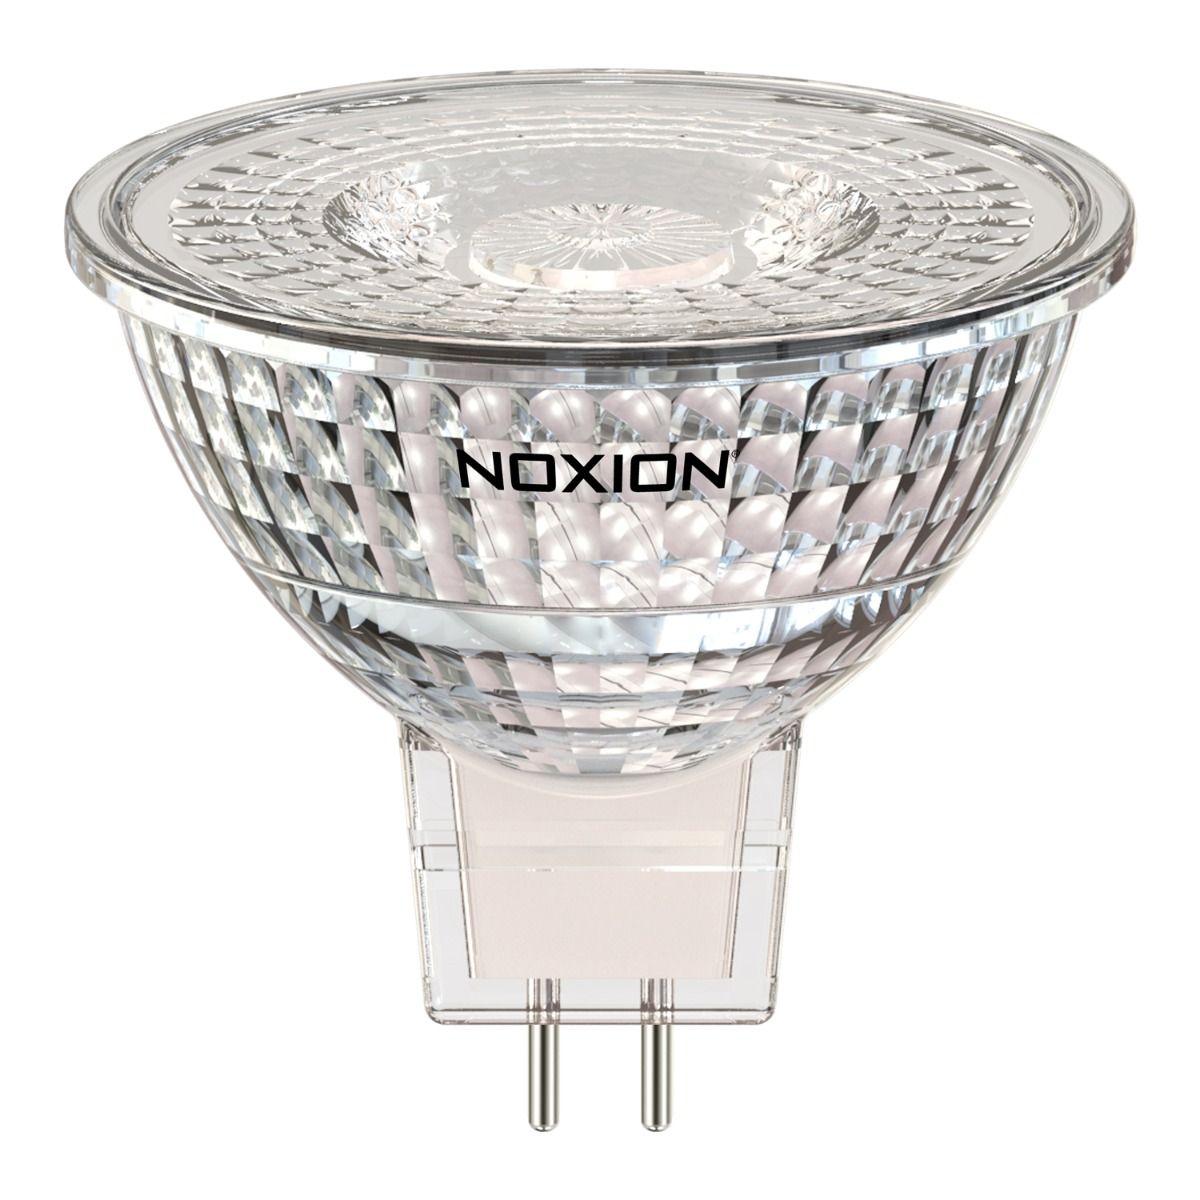 Noxion Foco LED GU5.3 5W 830 36D 470lm   Regulable - Luz Cálida - Reemplazo 35W